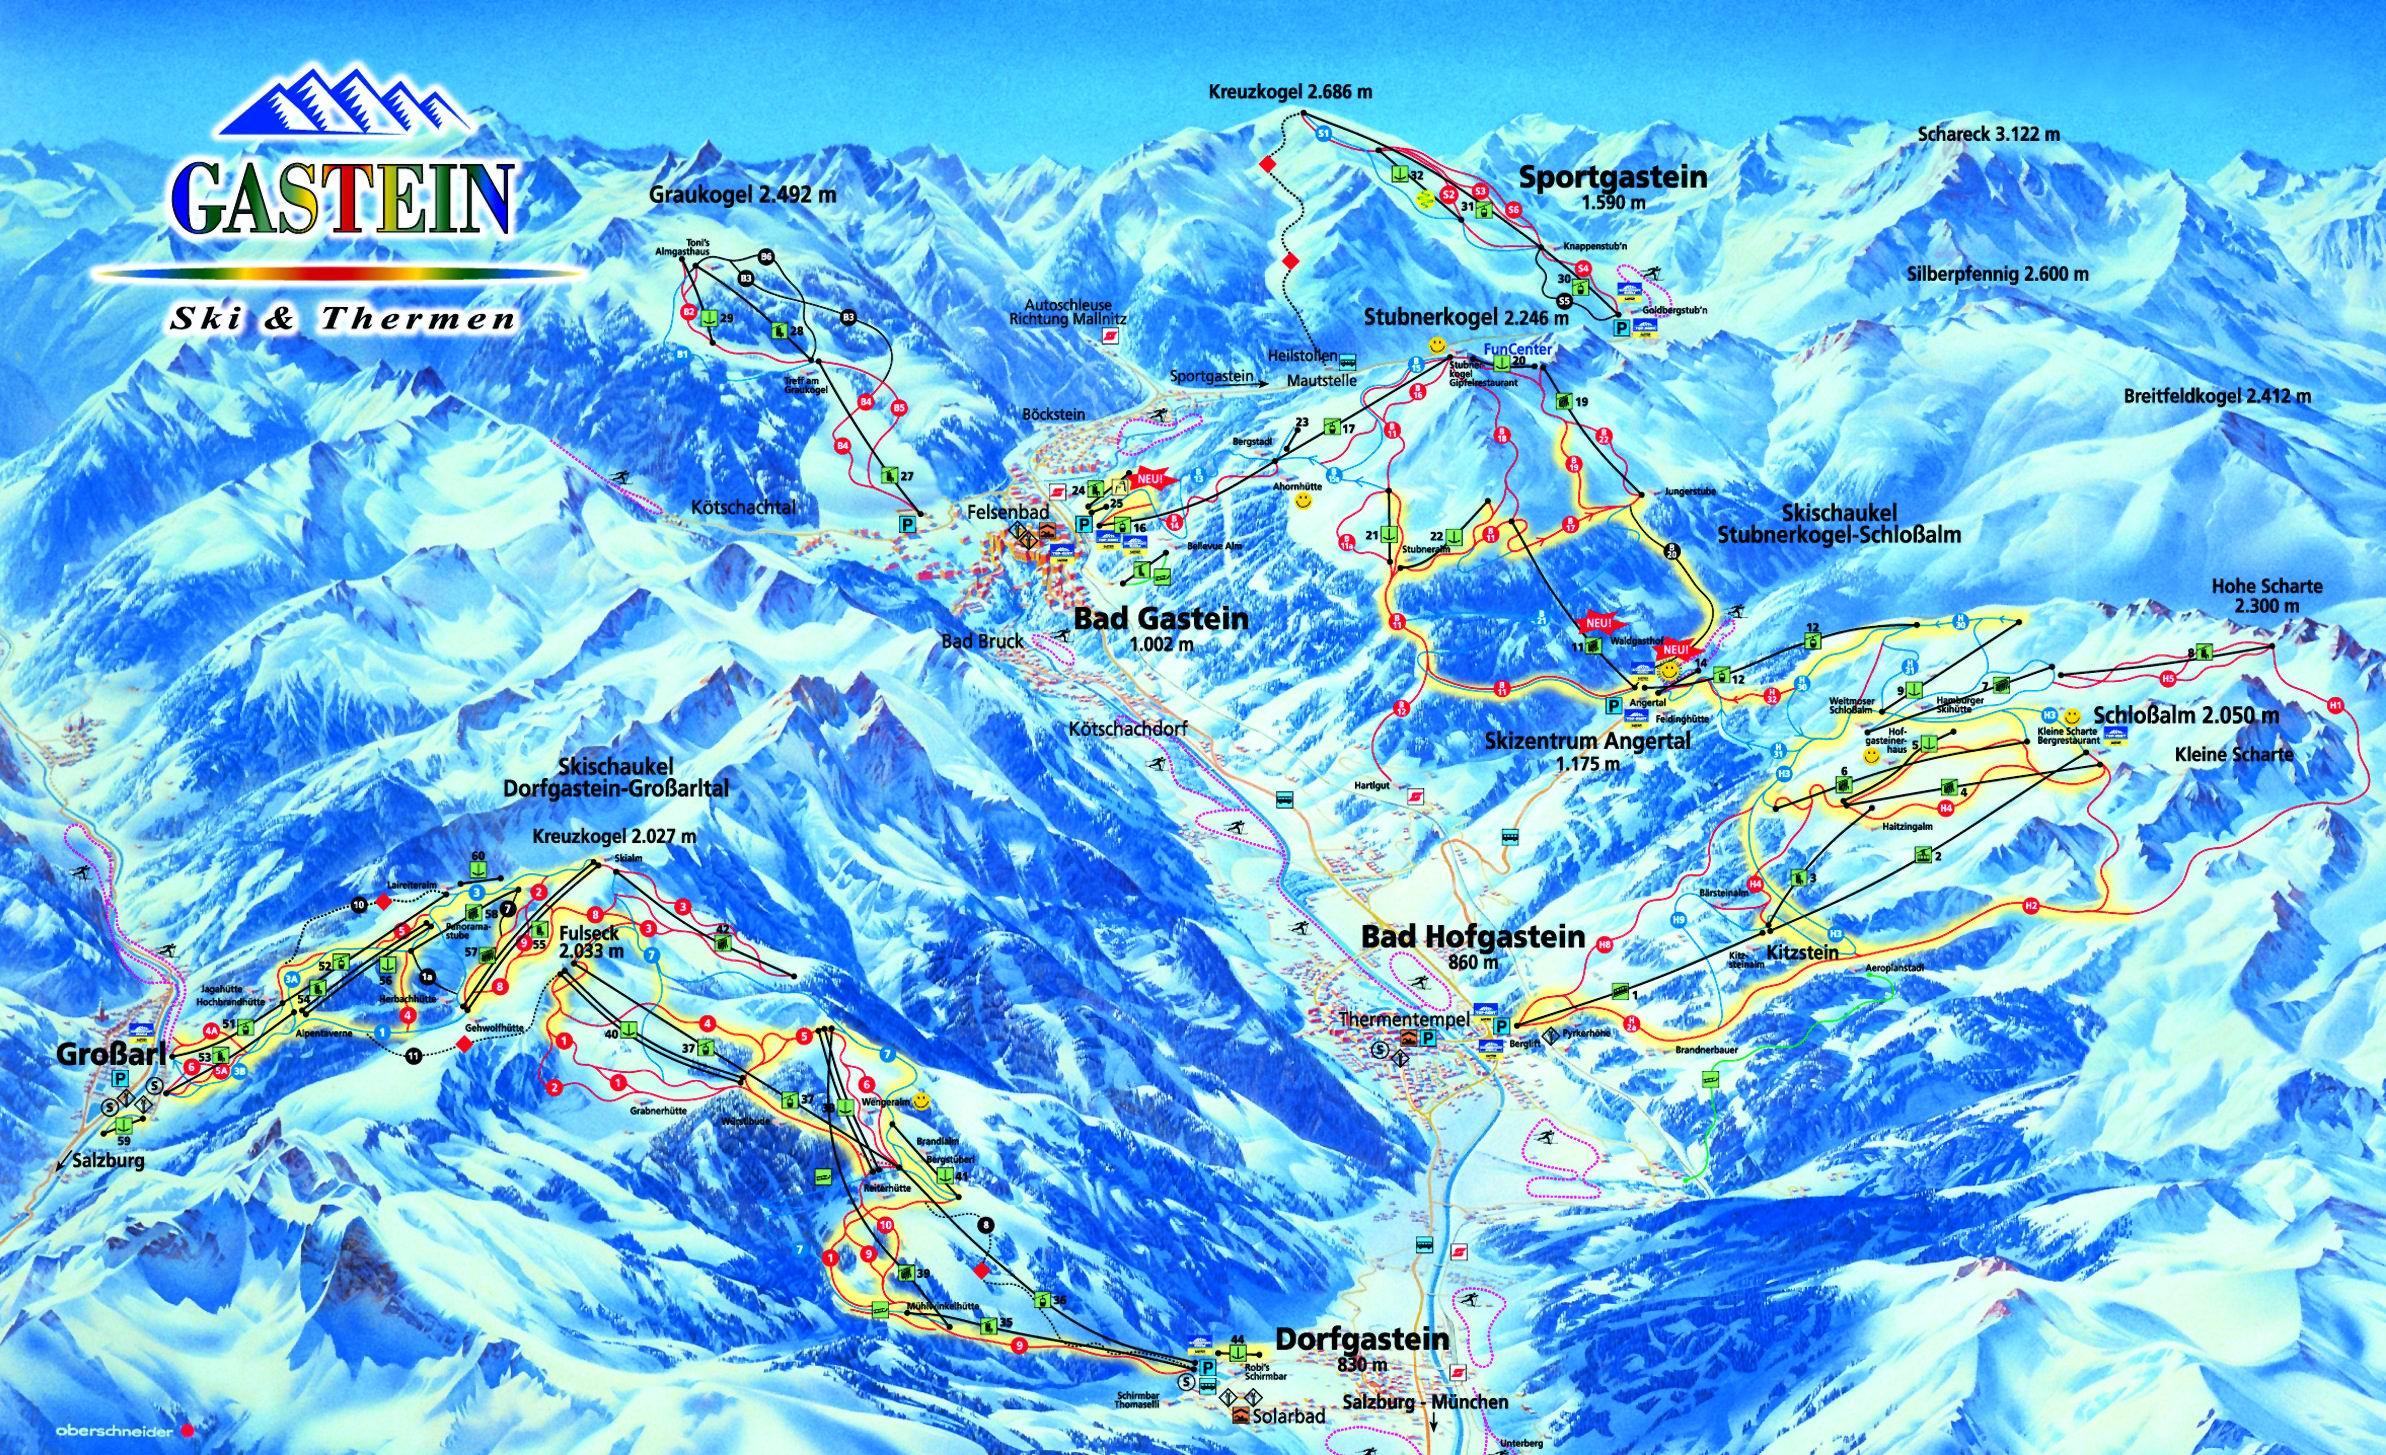 Gastein-völgy